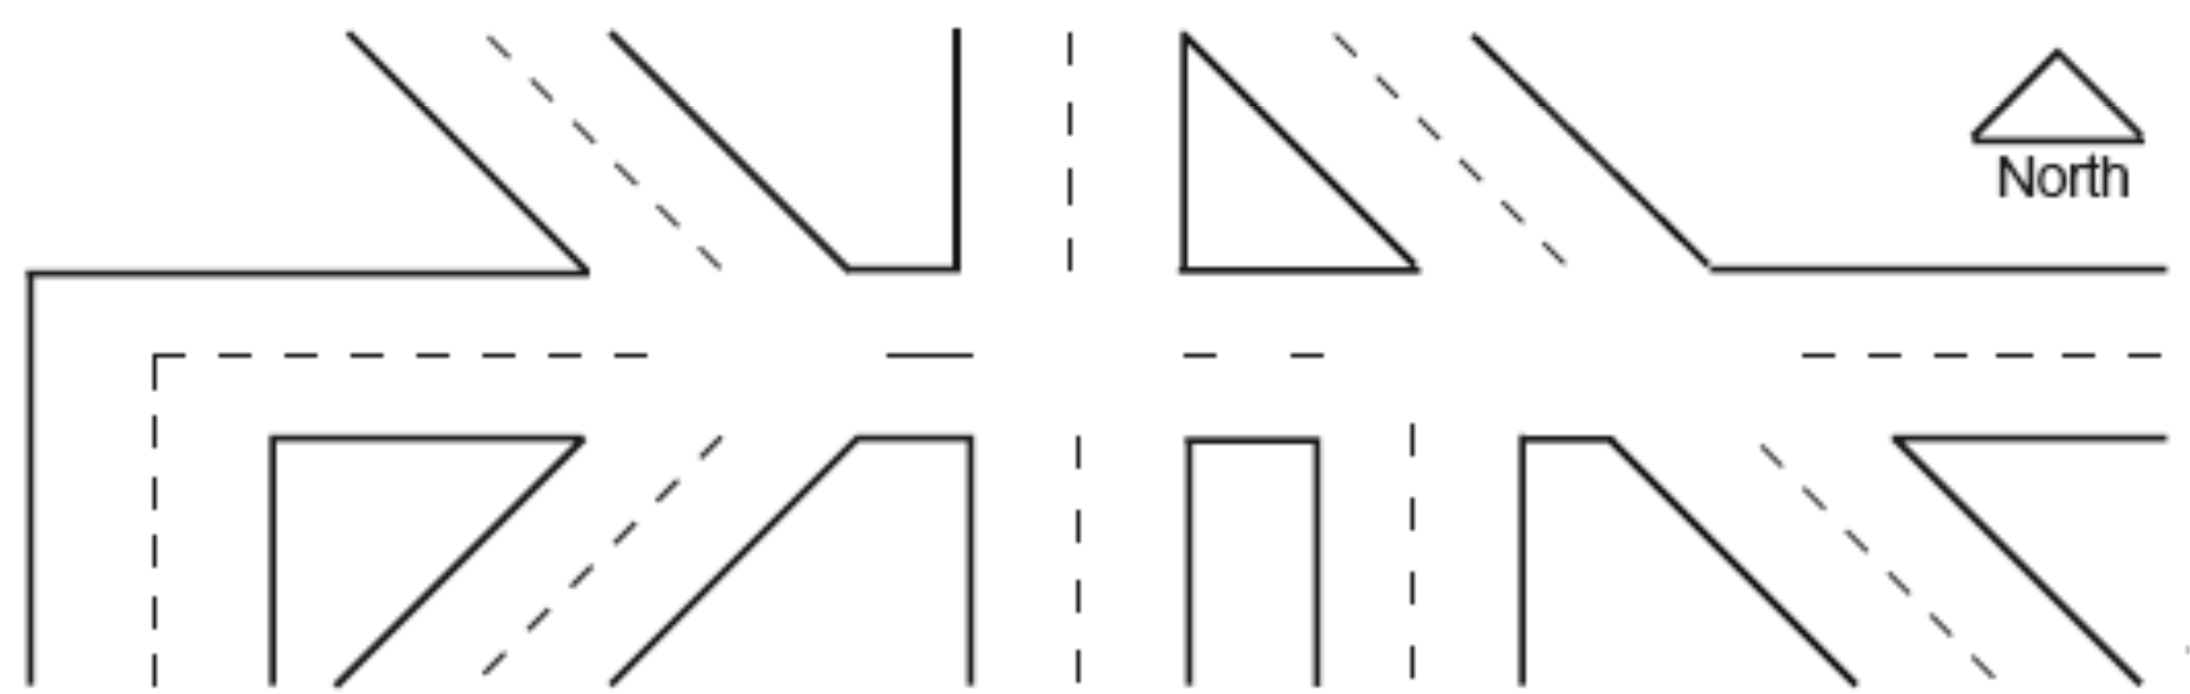 Traffic Accident Diagram Template